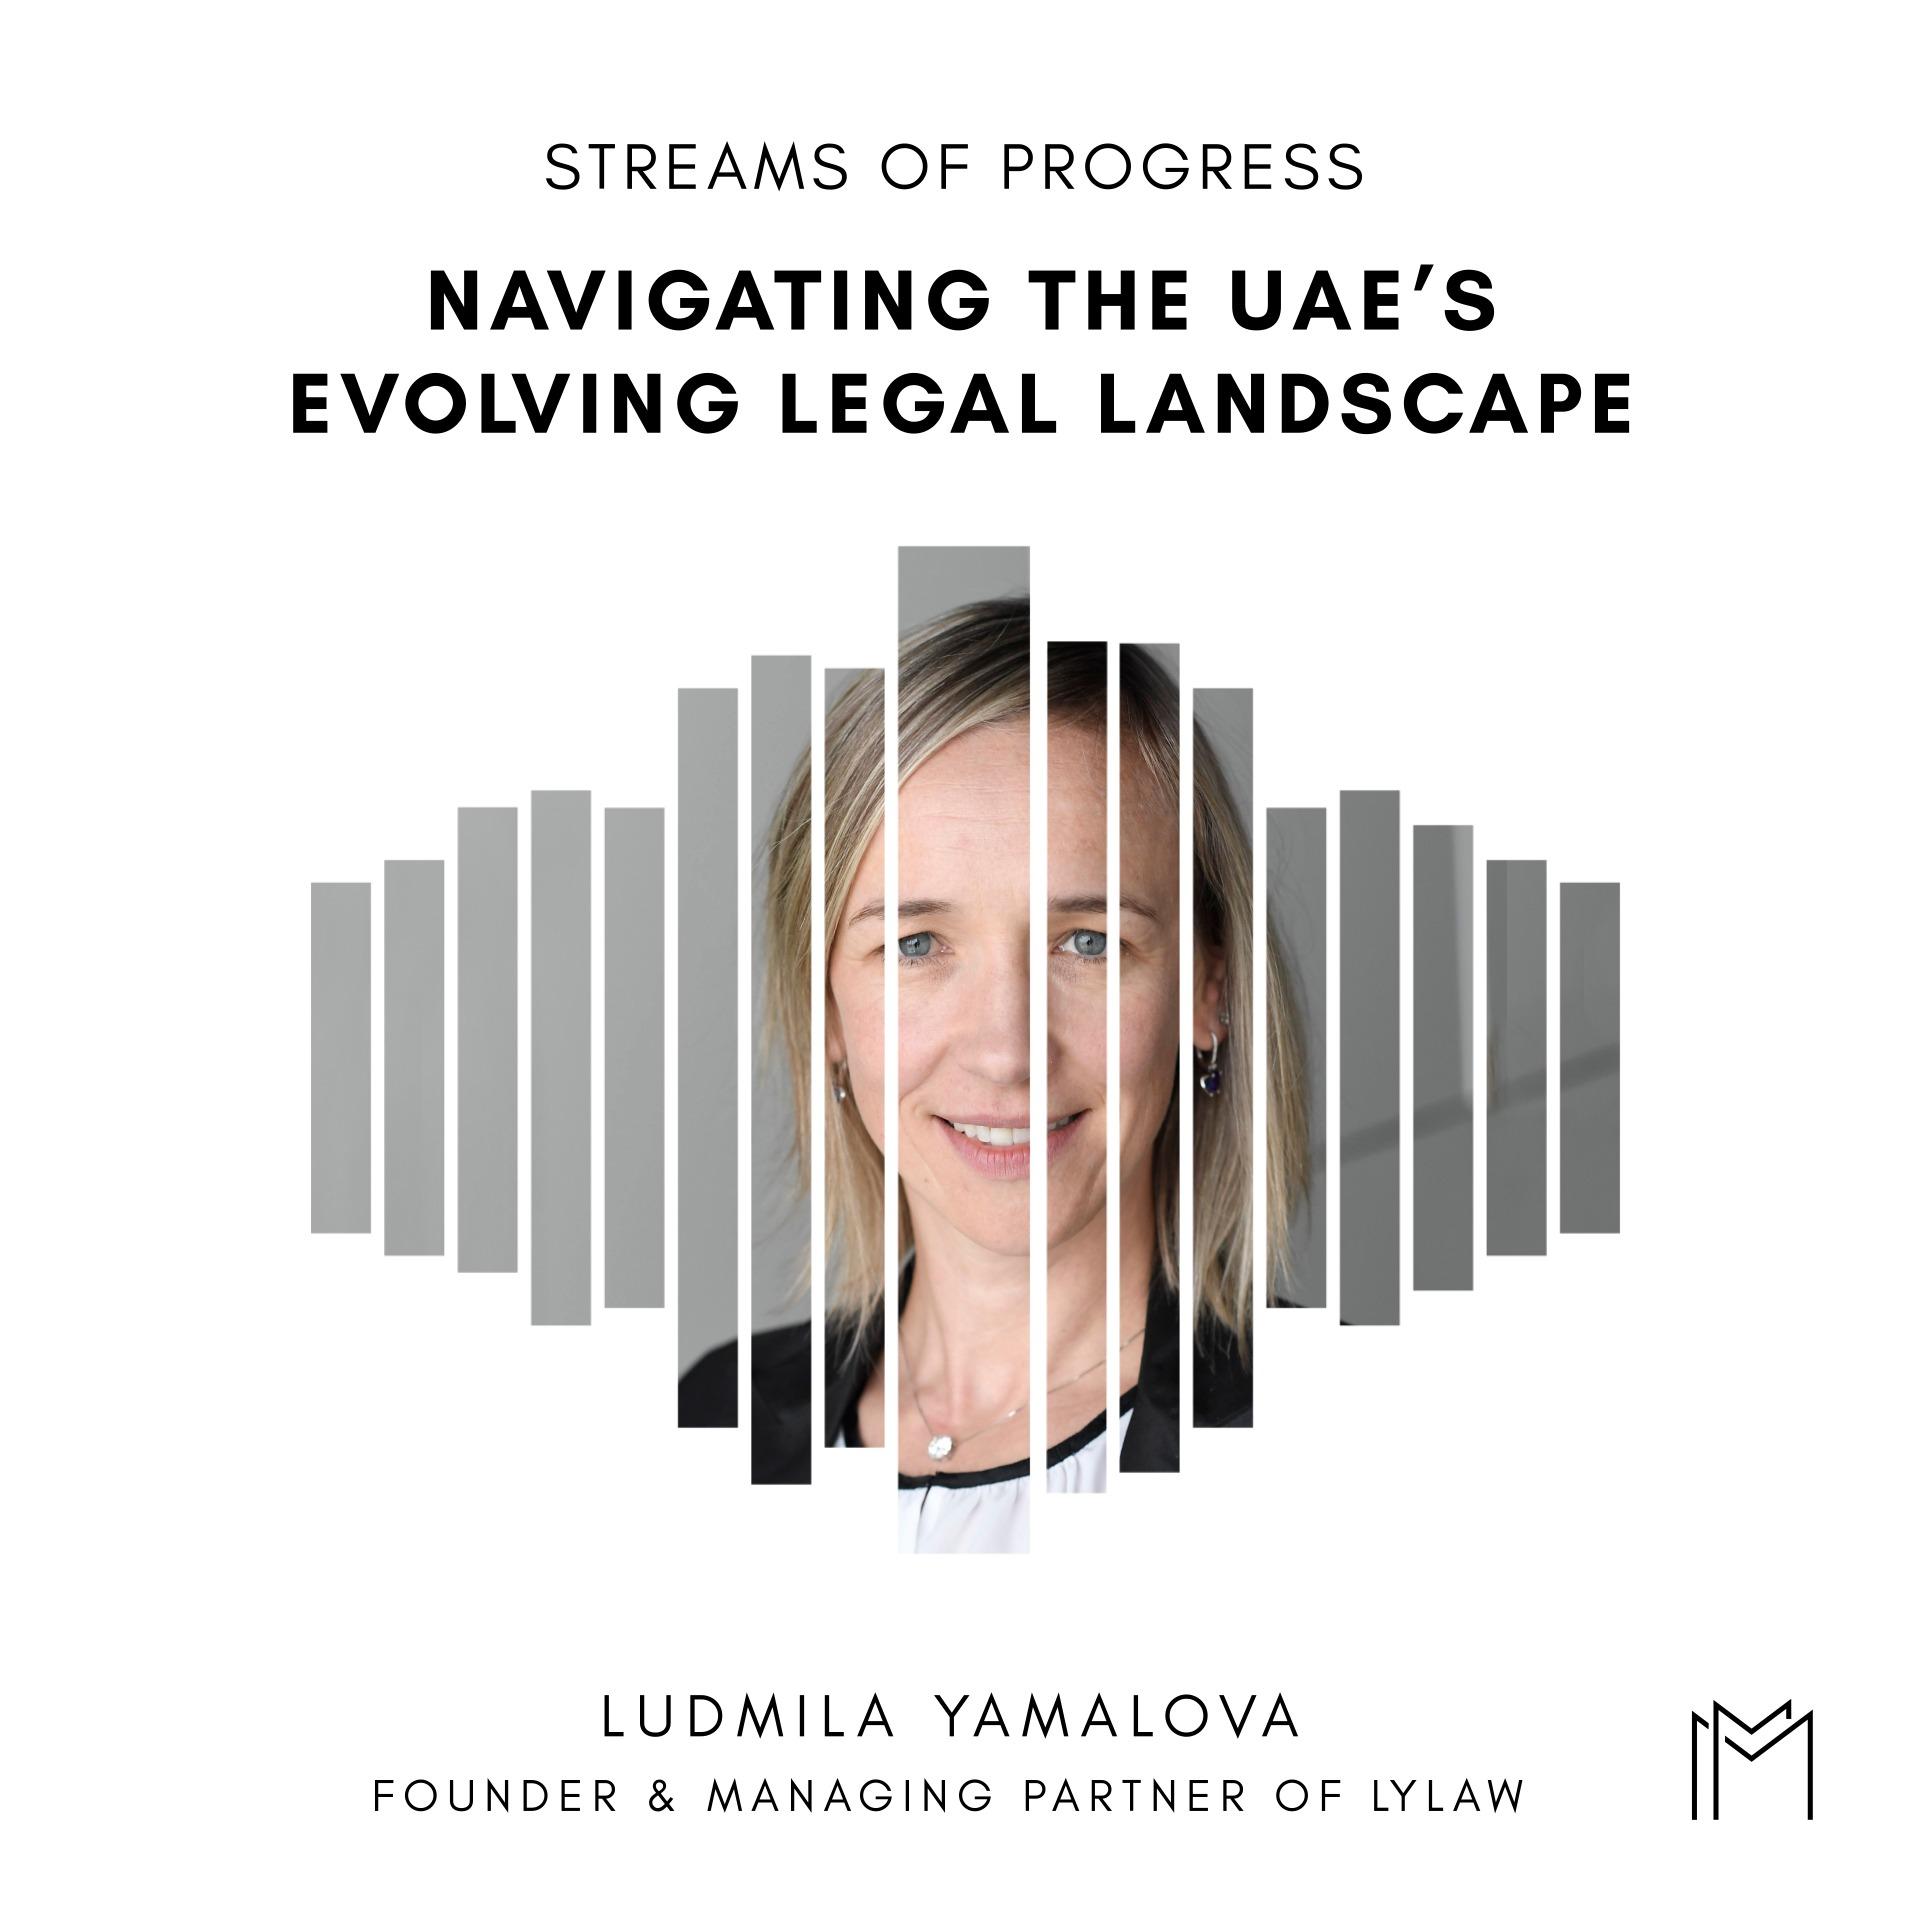 Ep026 - Ludmila Yamalova, Managing Partner at LYLaw